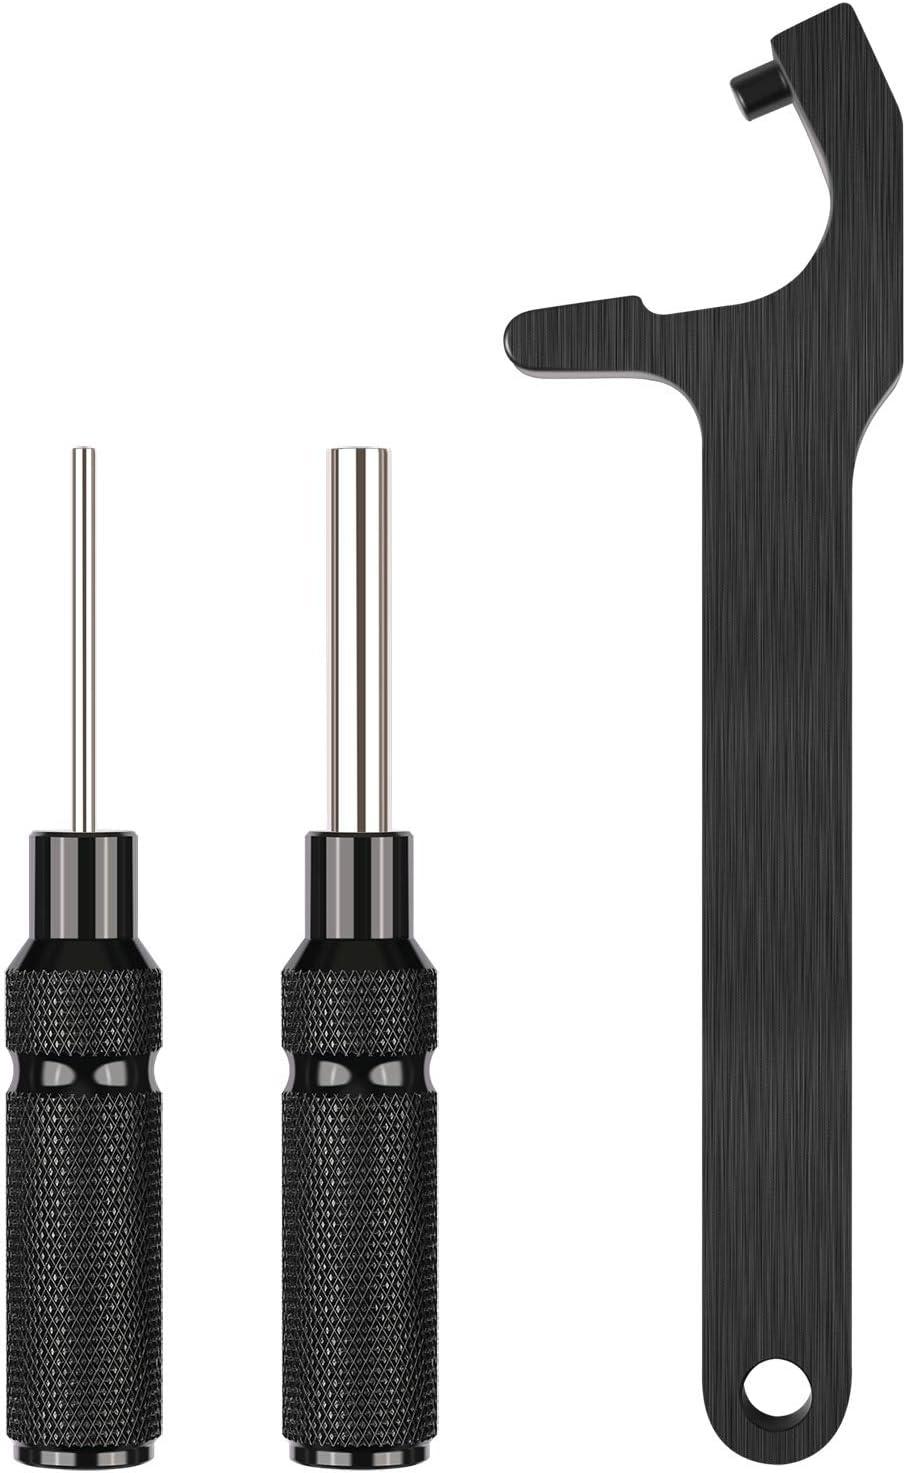 Hexagonal Handlebar Installation Tool Riflescope Pin Punch 2 En 1 Herramienta De Desmontaje Glock Tool Kit Magazine Hex Tool Armatures De Protecci/ón Hoonee Herramienta De Desmontaje